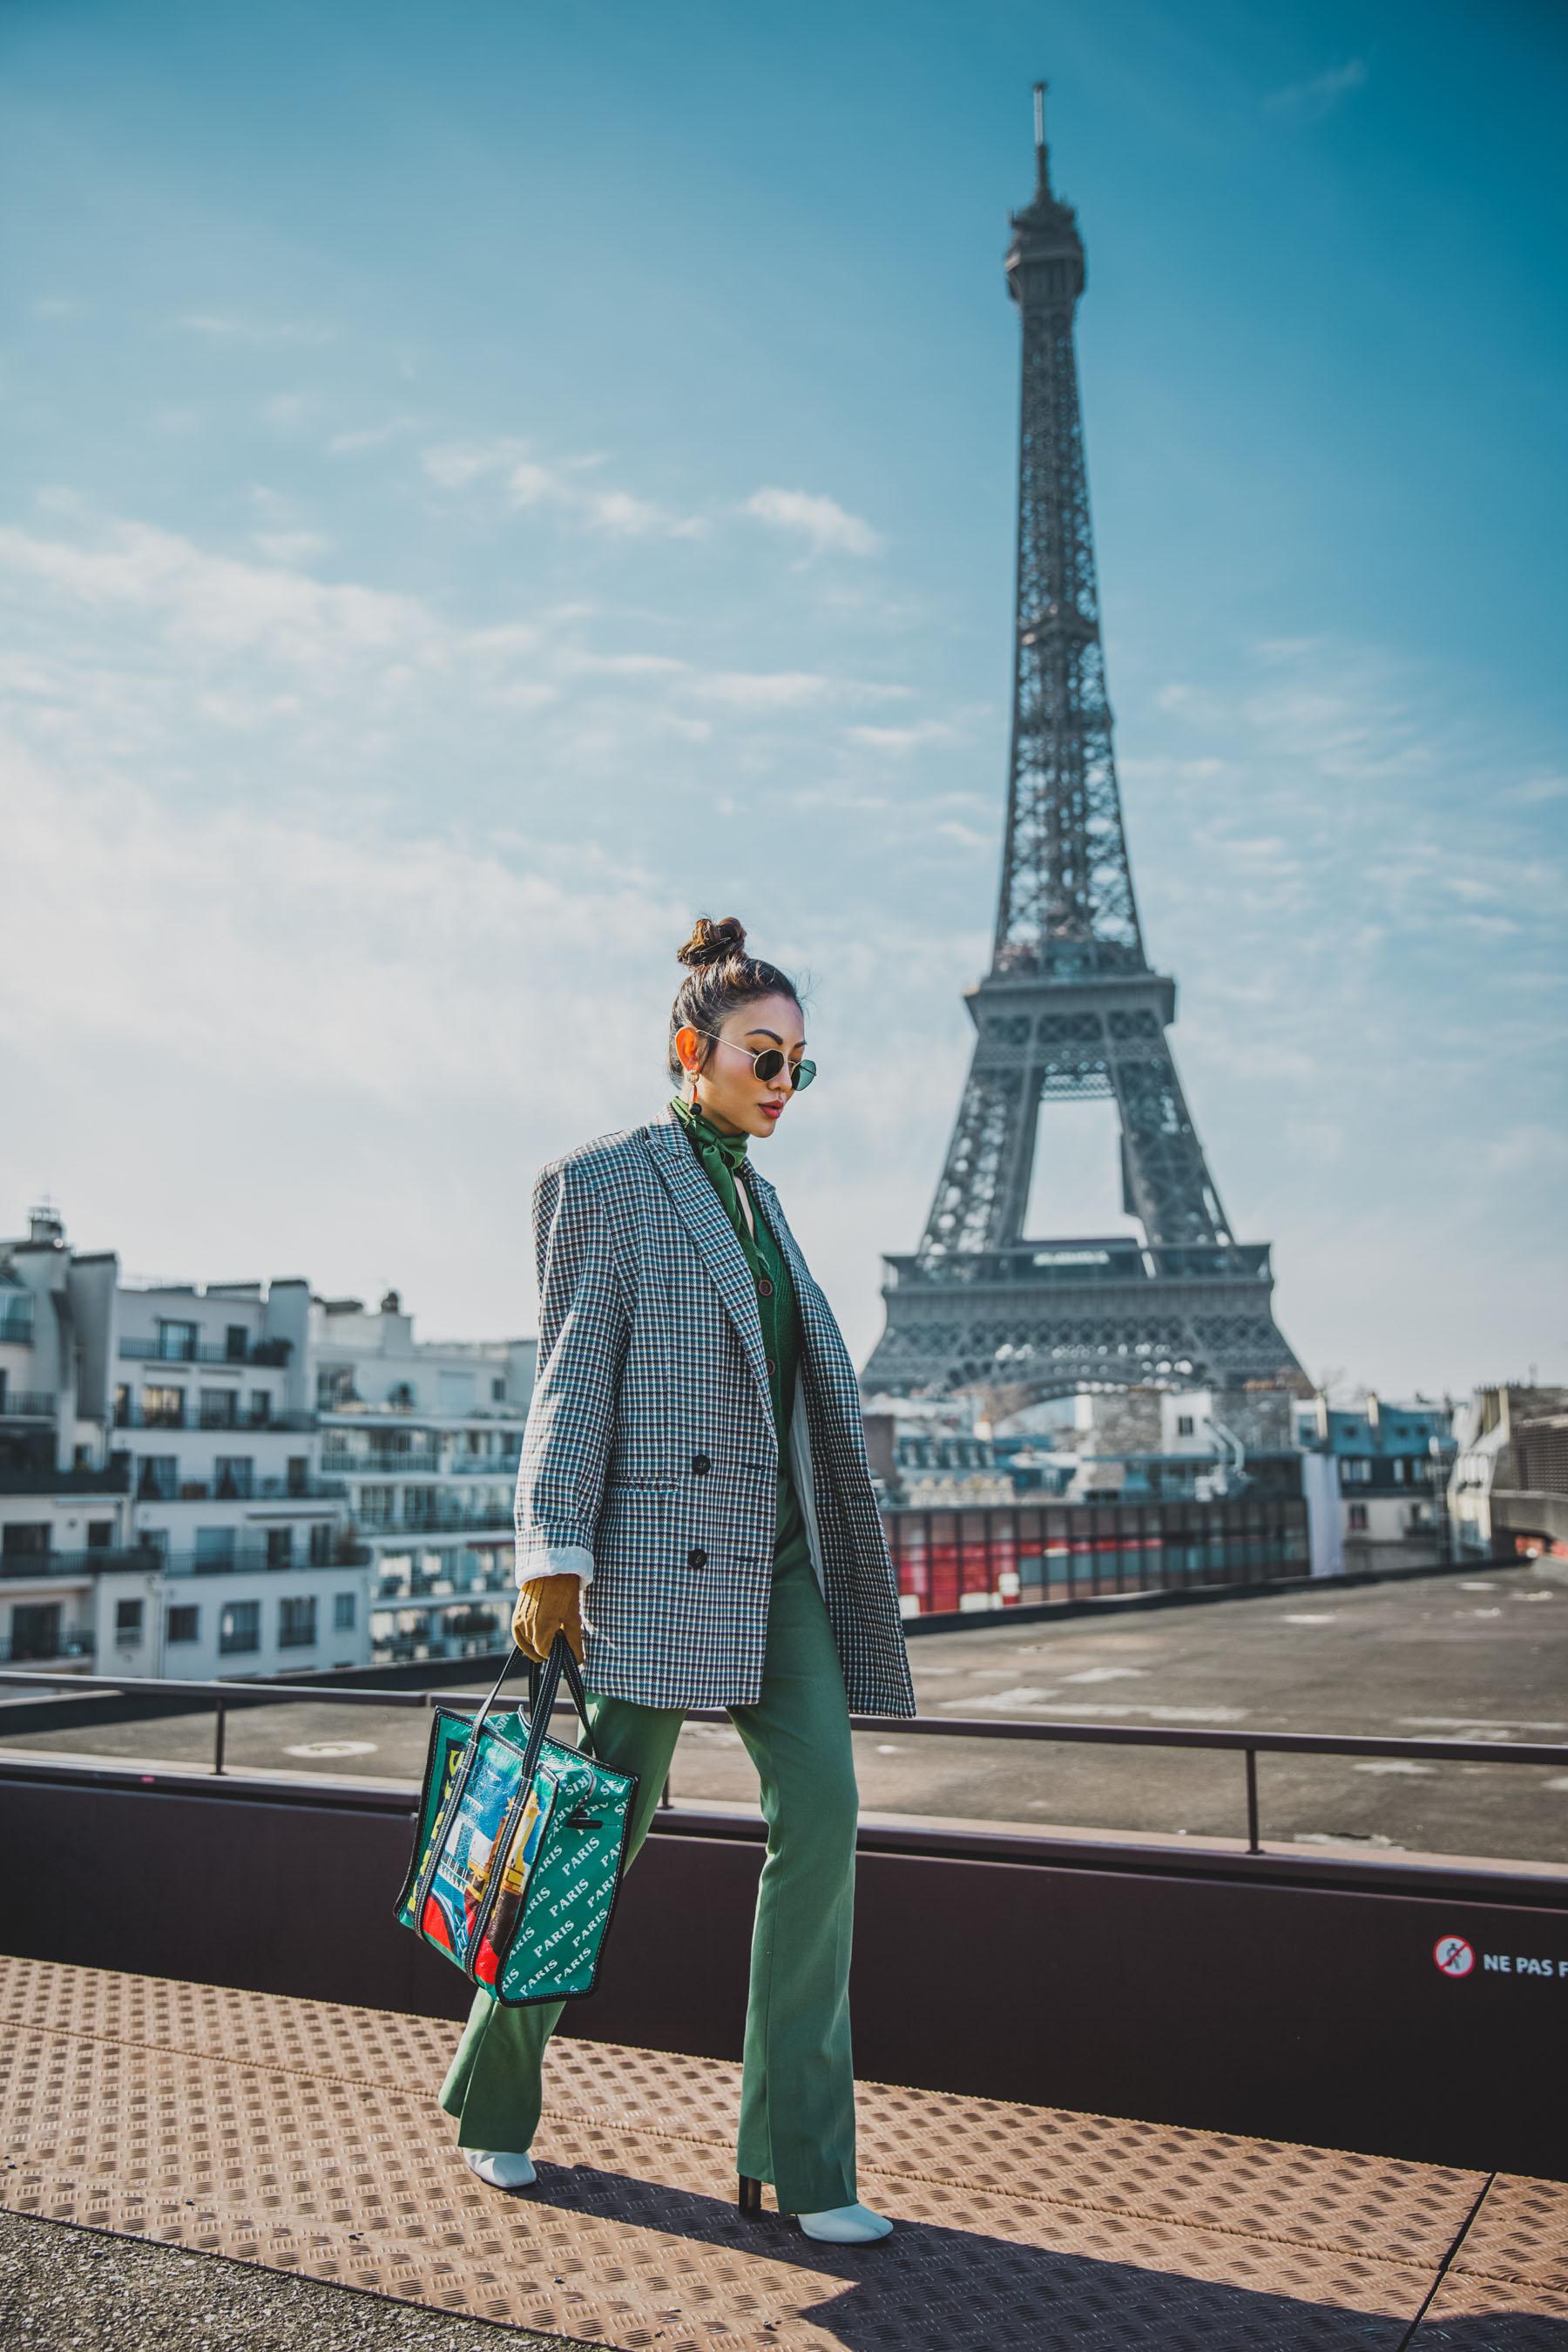 2018 handbag trend - balenciaga paris shopper tote, mytheresa bags, pfw street style // Notjessfashion.com